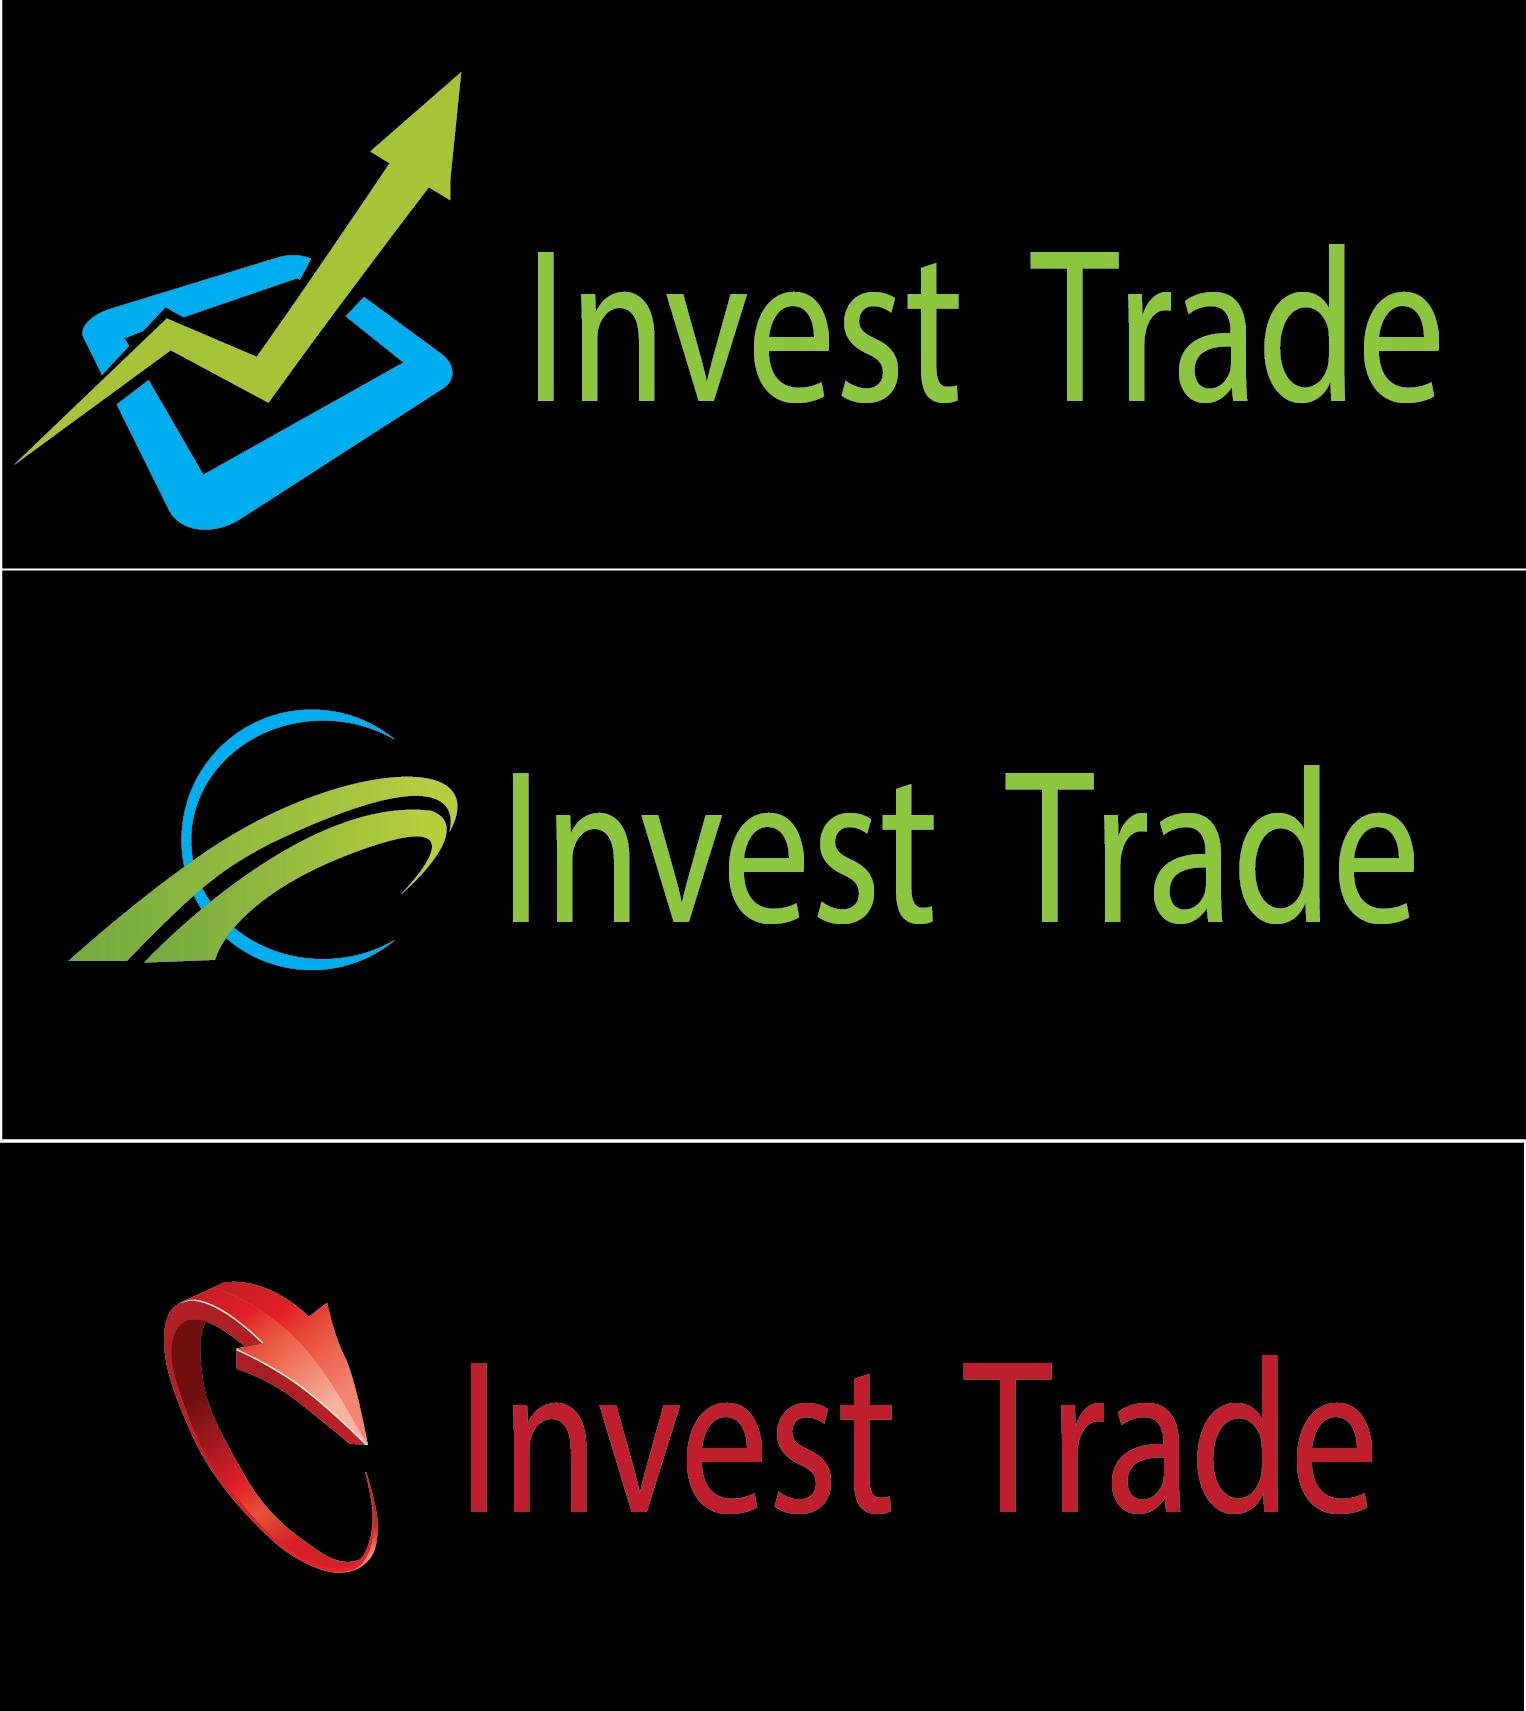 Разработка логотипа для компании Invest trade фото f_5565120f3b358094.jpg